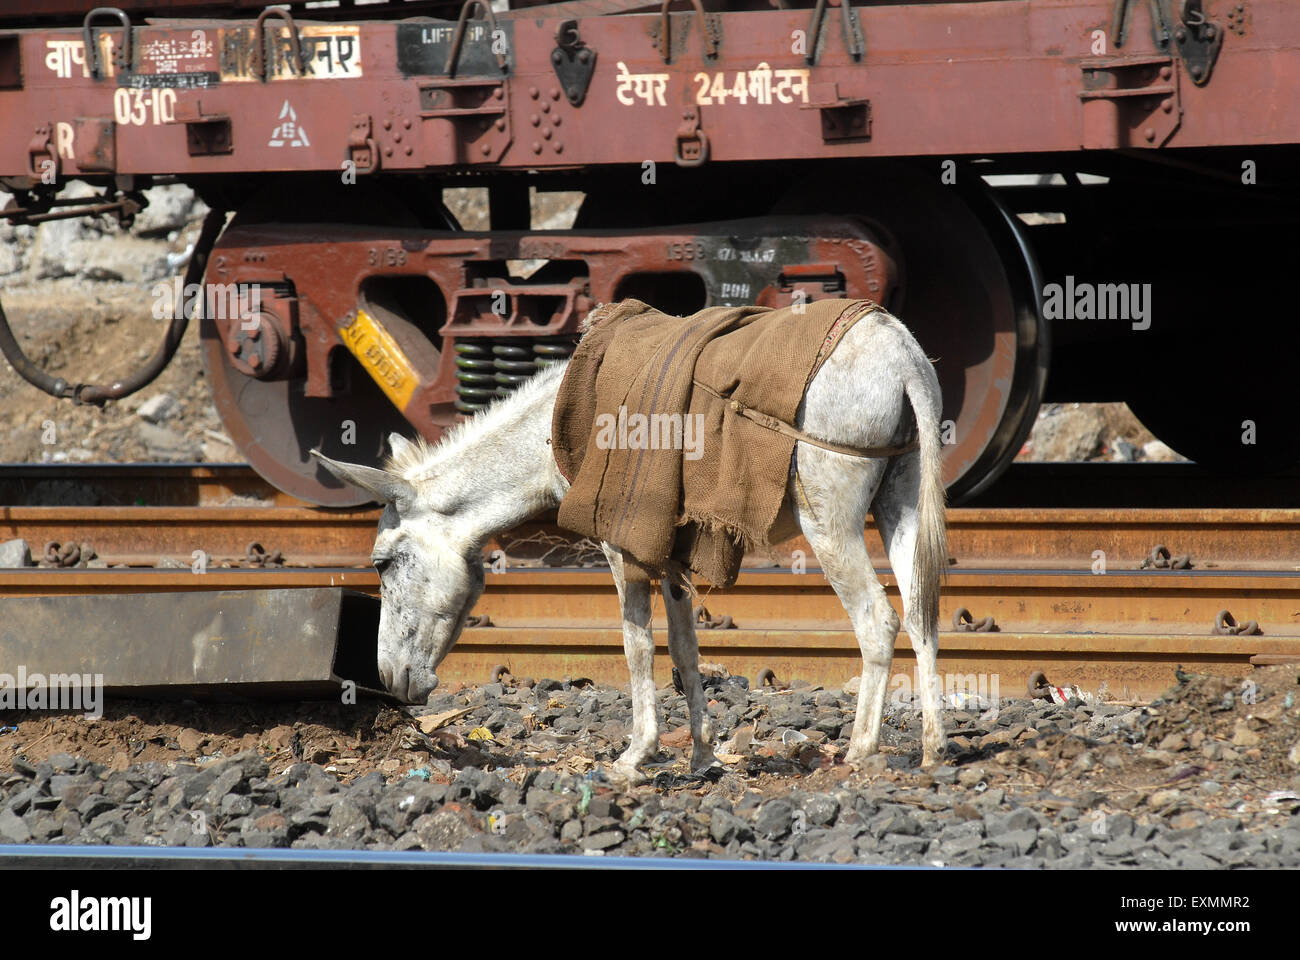 Labourers employ donkeys to remove debris from the railway tracks near Sewri railway station in Mumbai - Stock Image